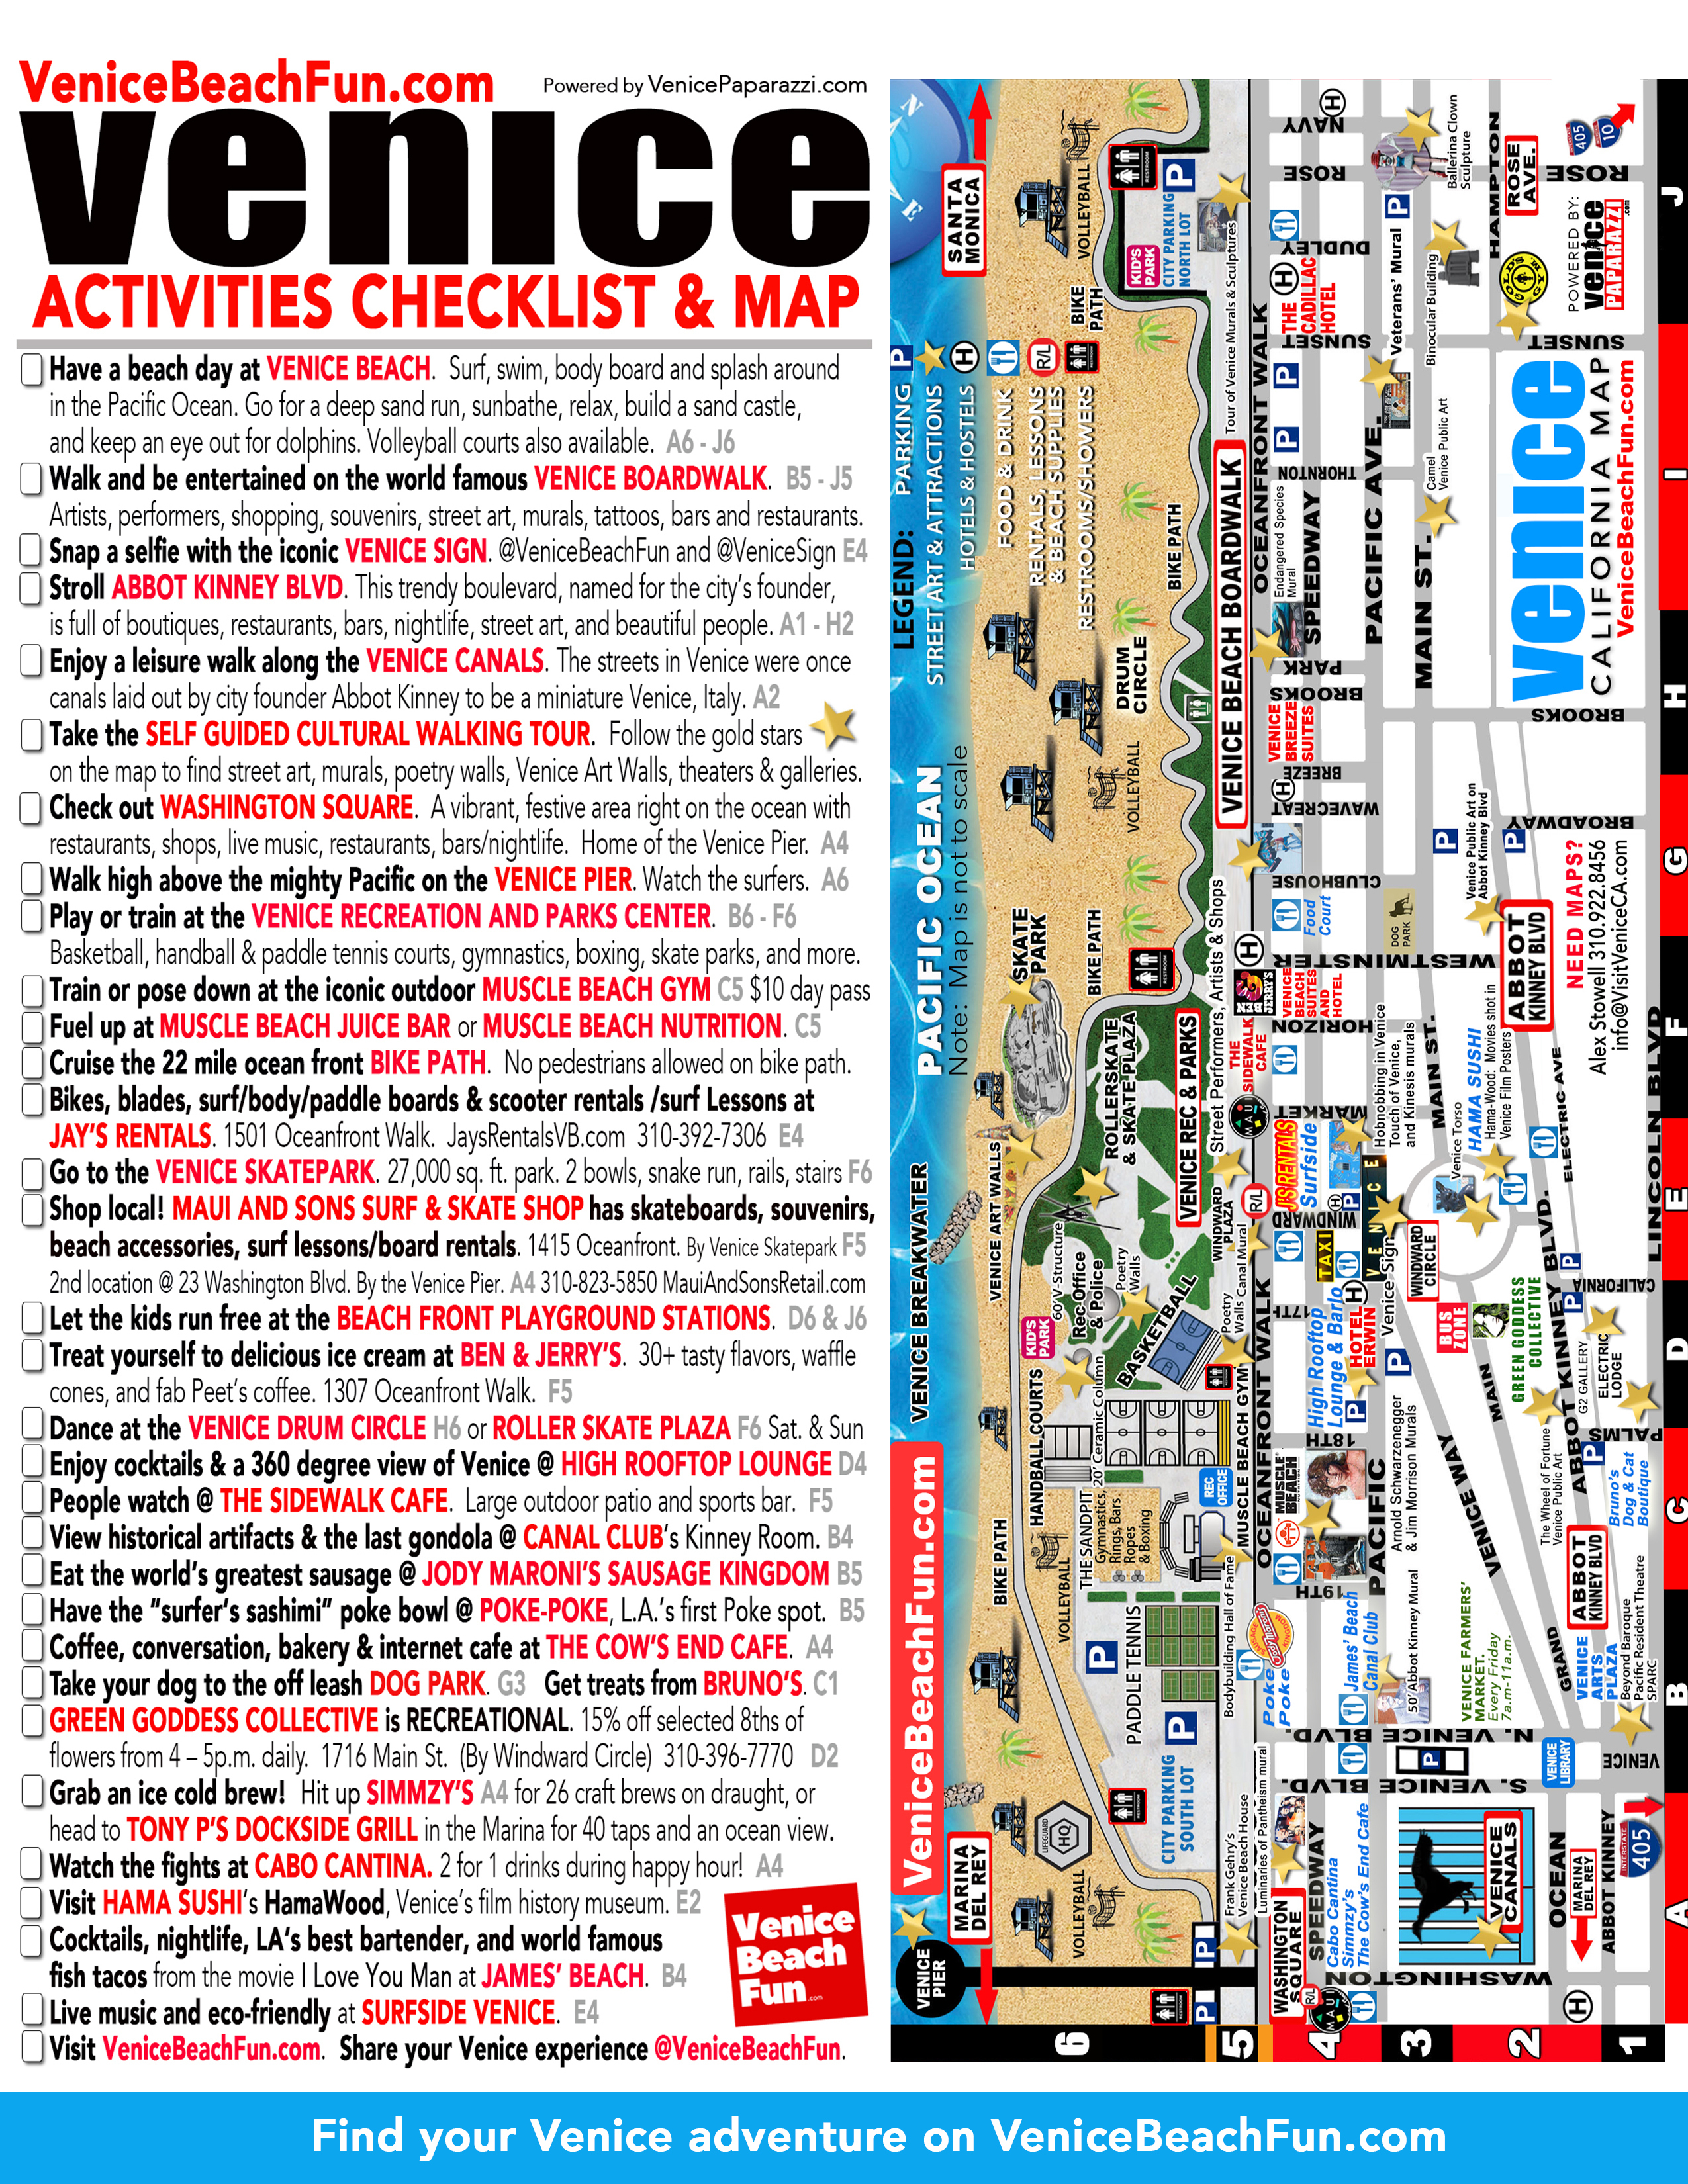 50+ Fun Things To Do In Venice, Ca - Map Of Venice California Area